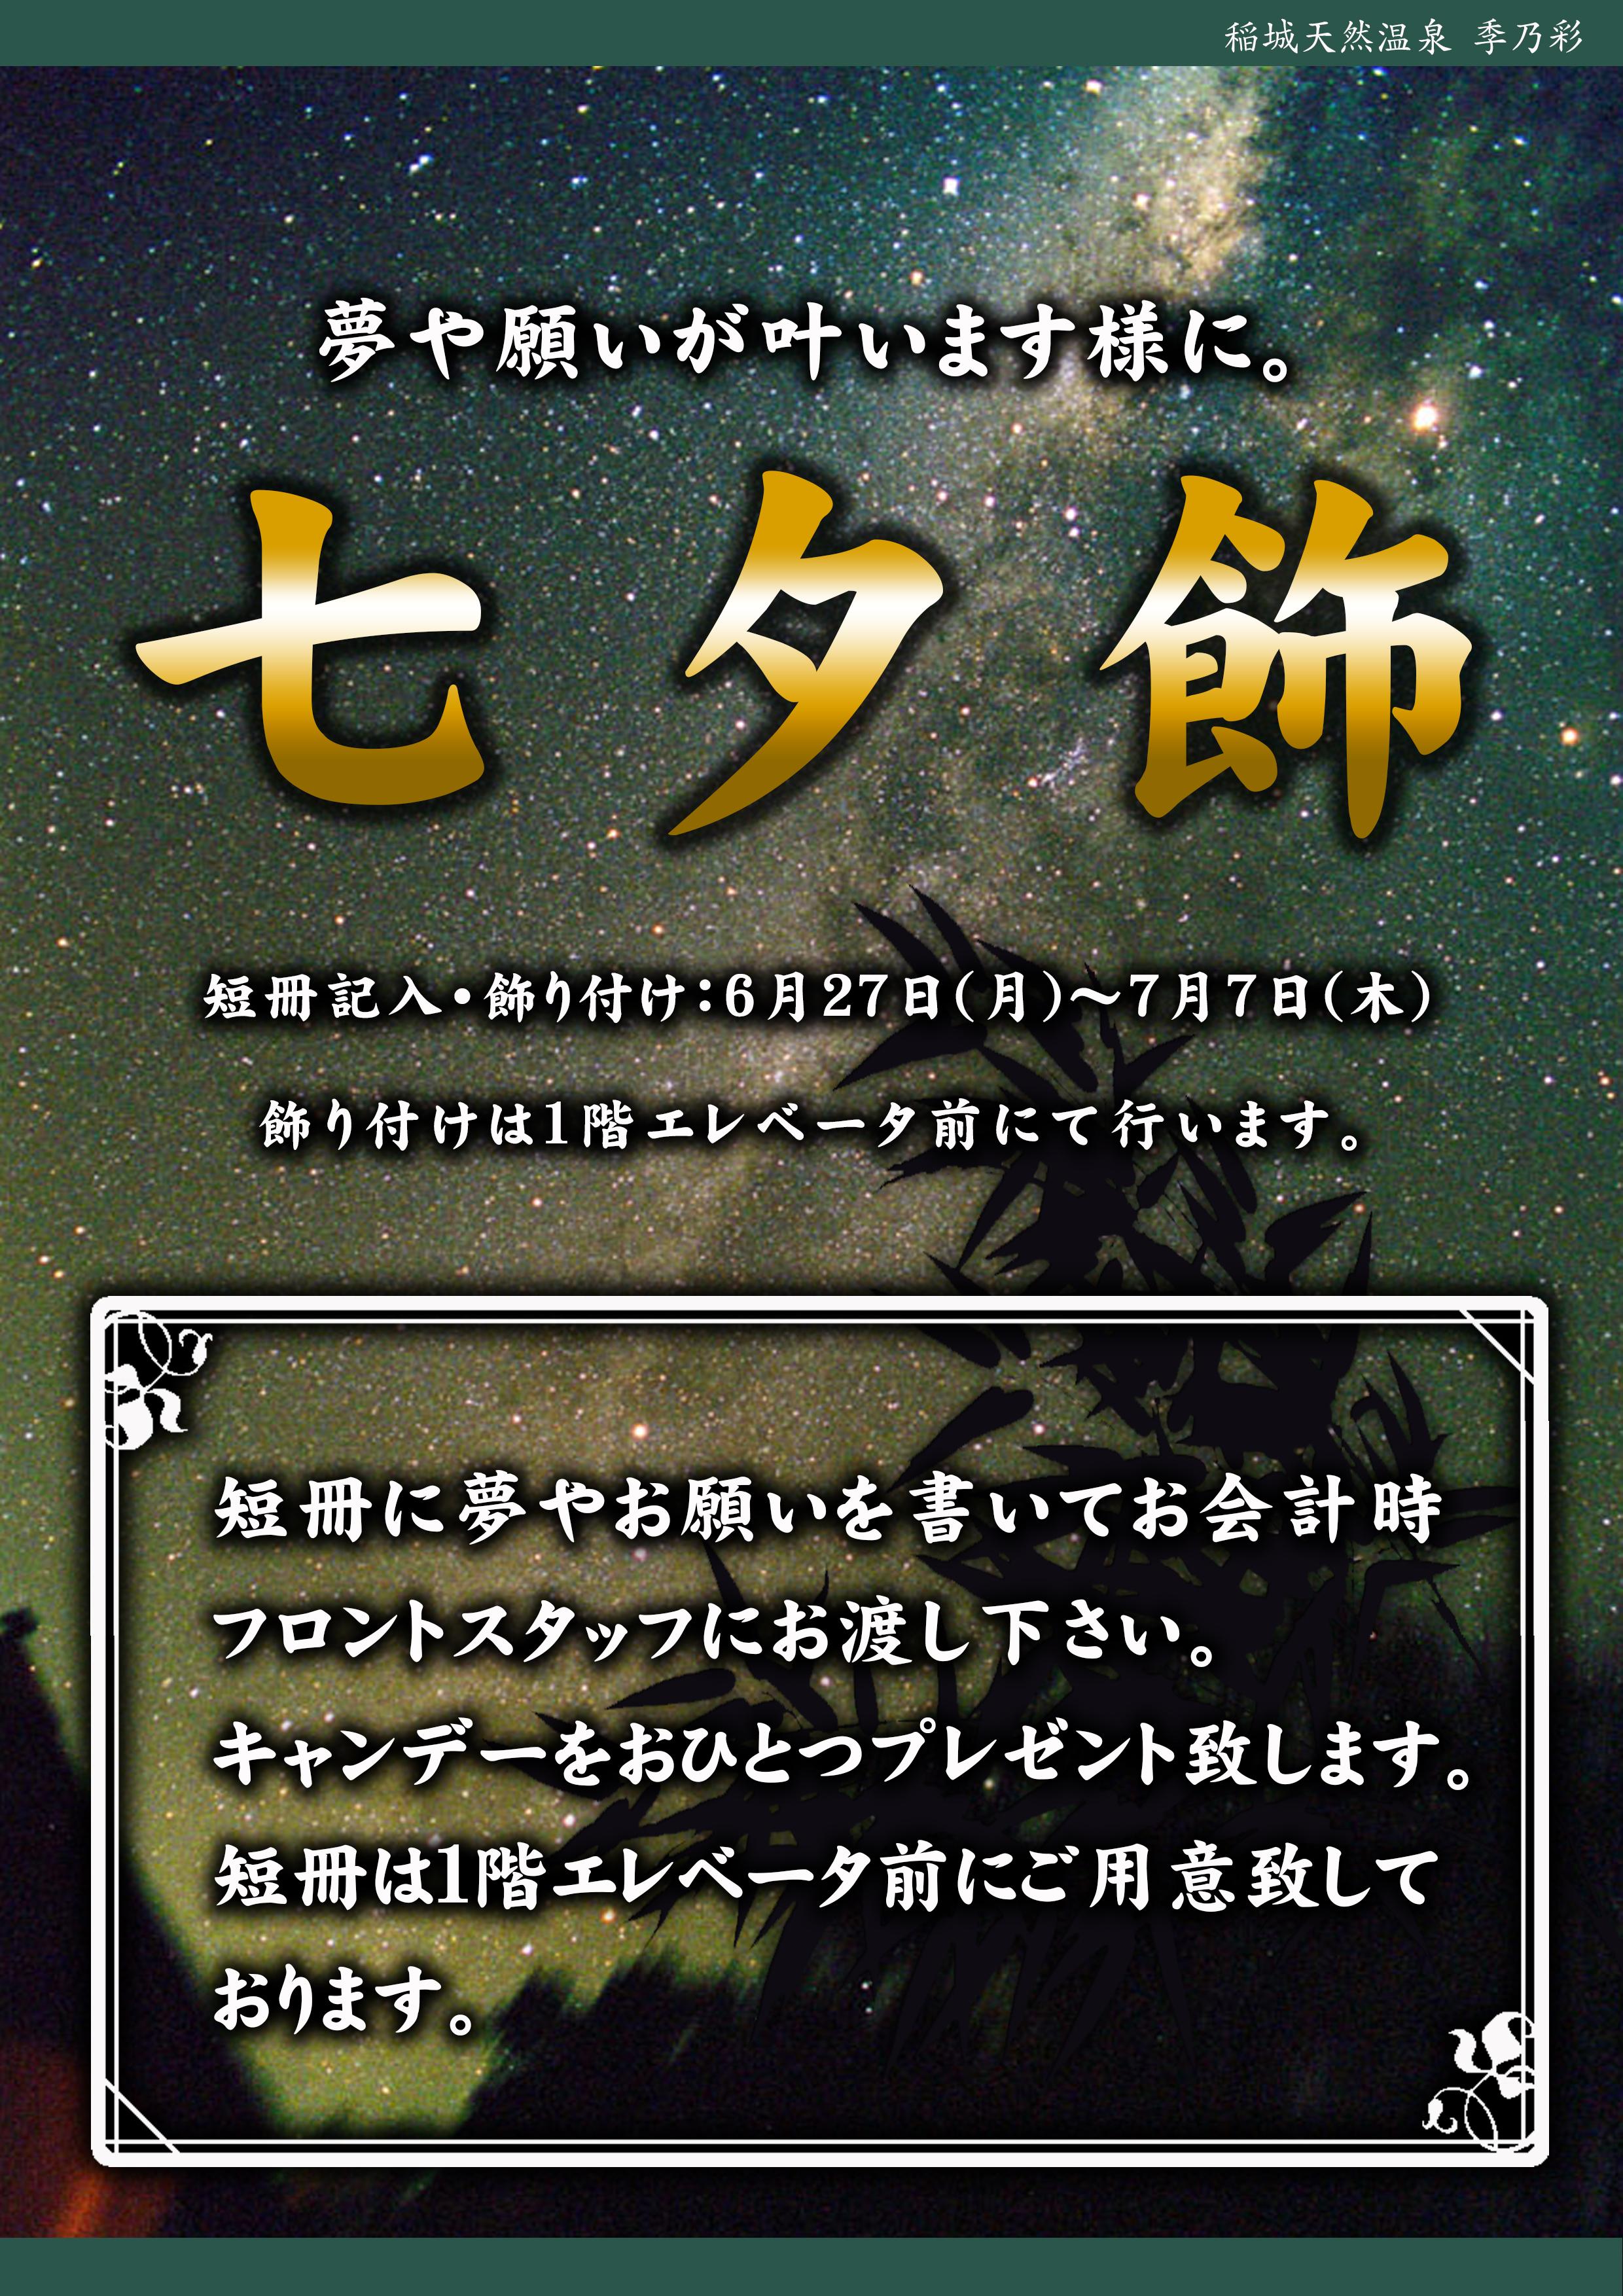 POP イベント 6月 七夕飾り2016